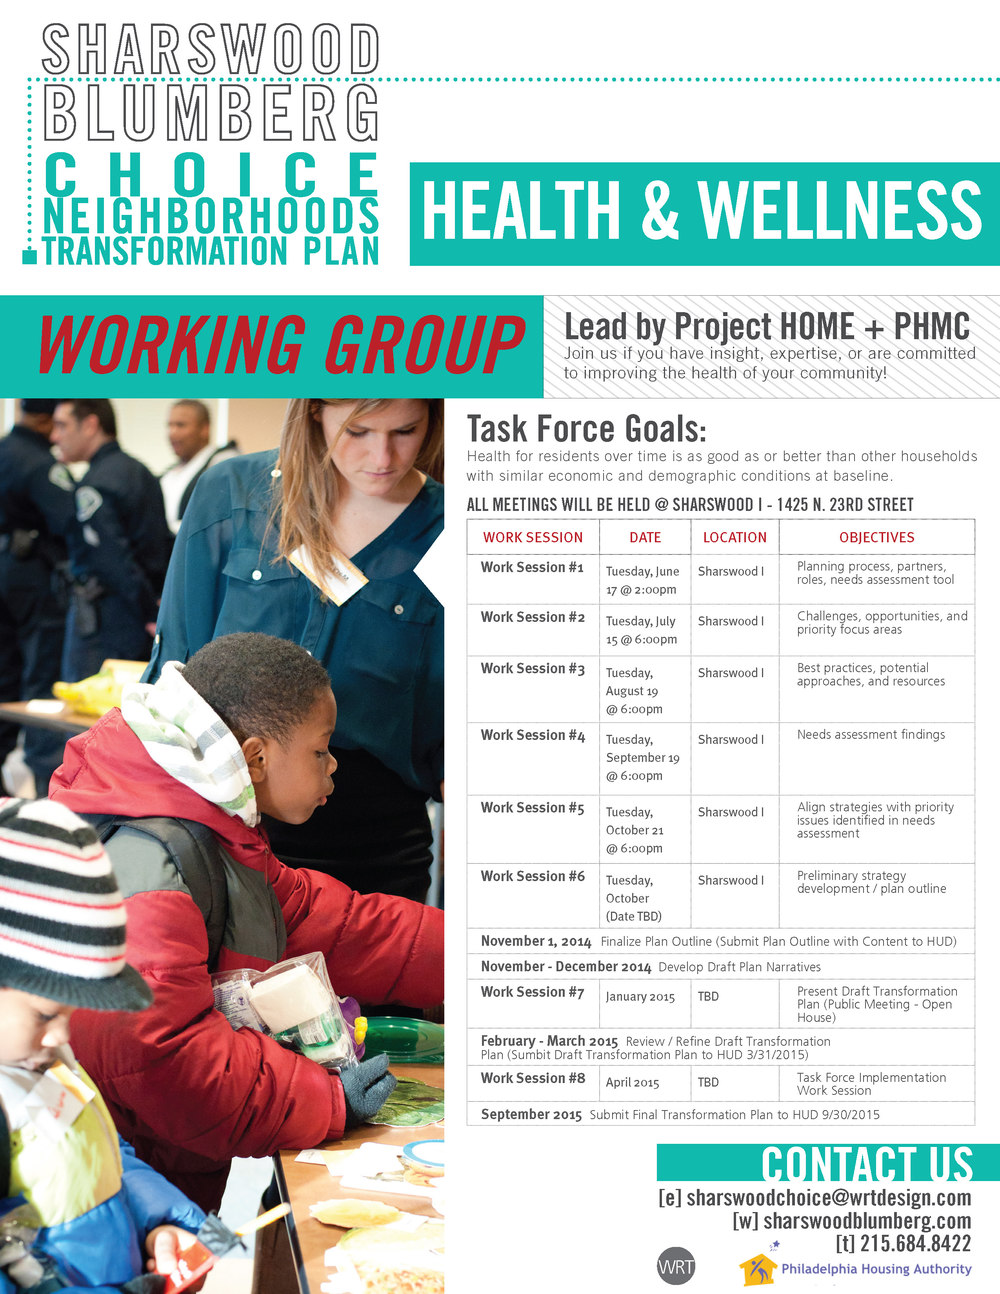 Health and Wellness Working Group.jpg